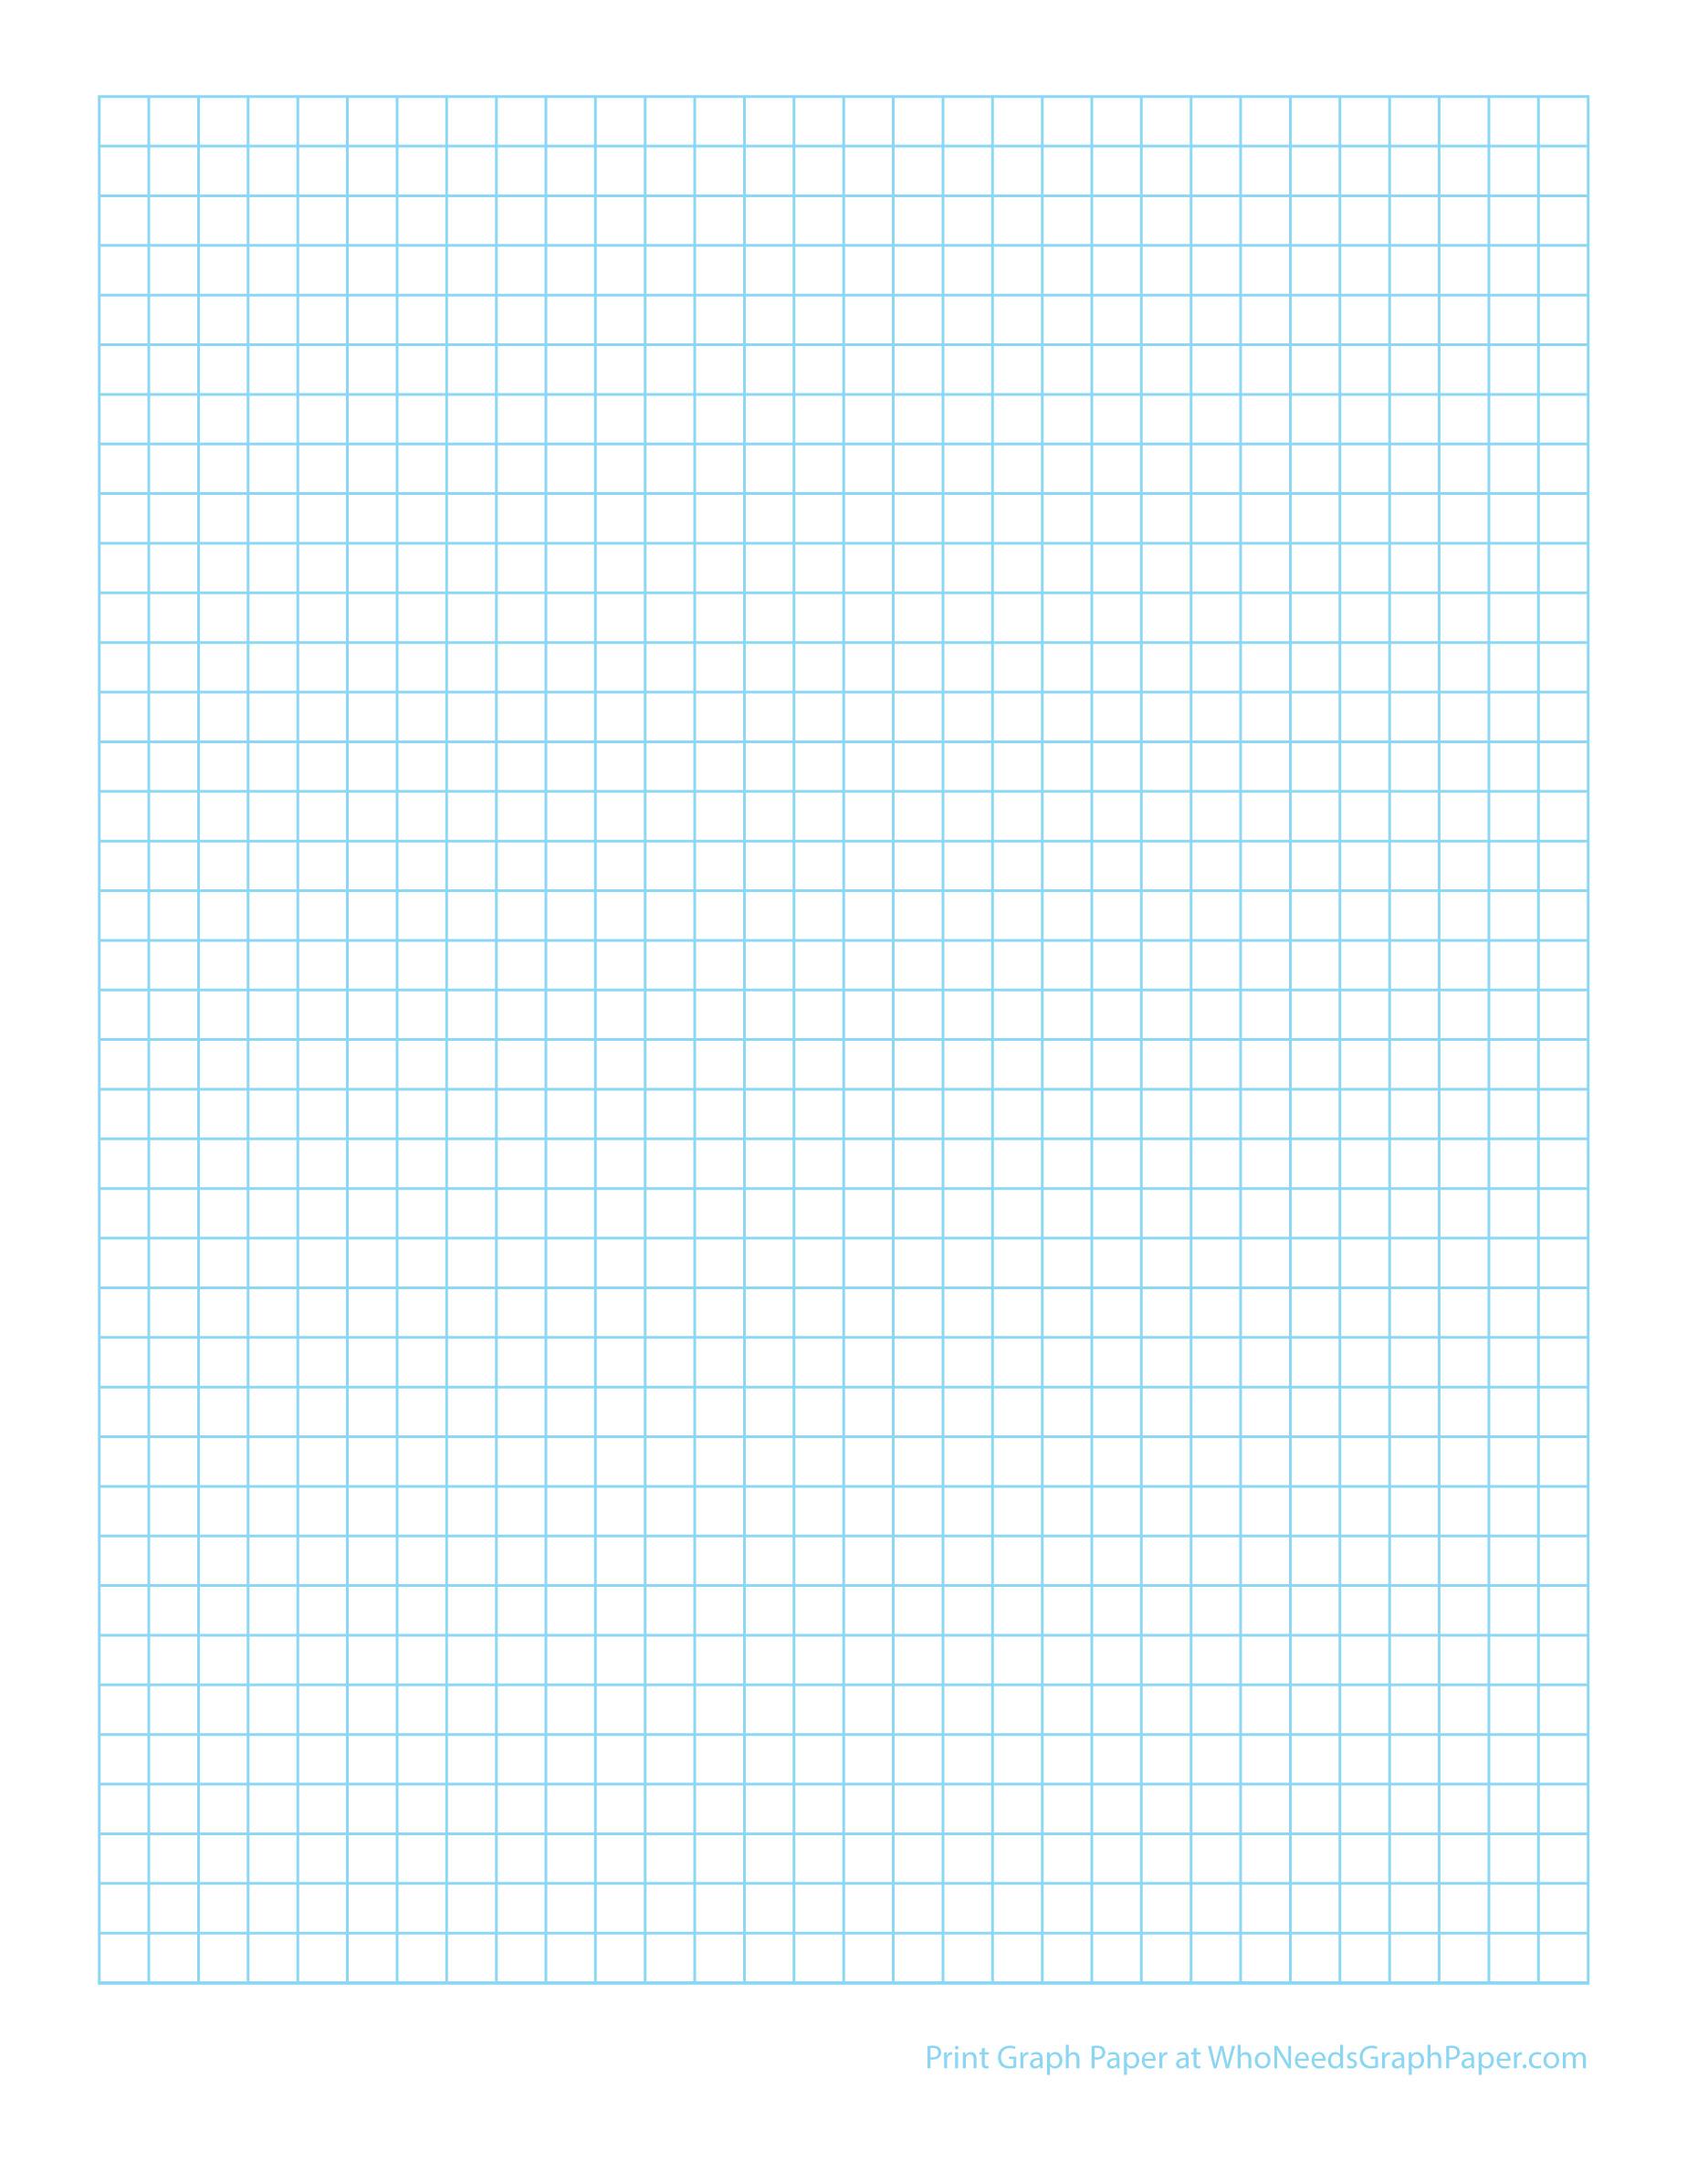 Worksheet Print Out Graph Paper Grass Fedjp Worksheet Study Site